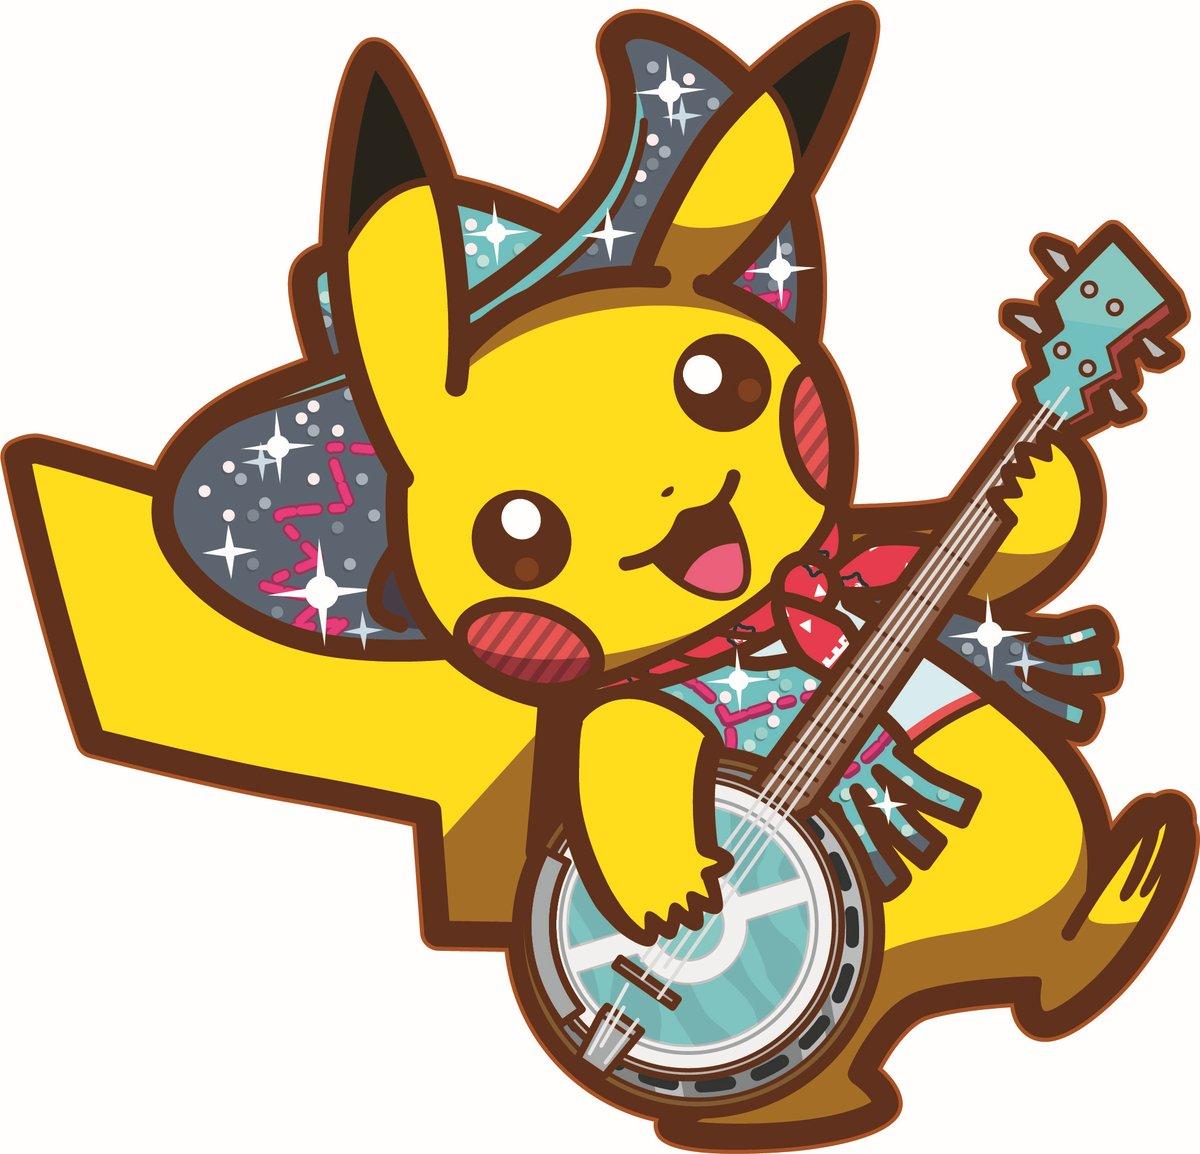 Pokemon worlds 2018 prizes for kids